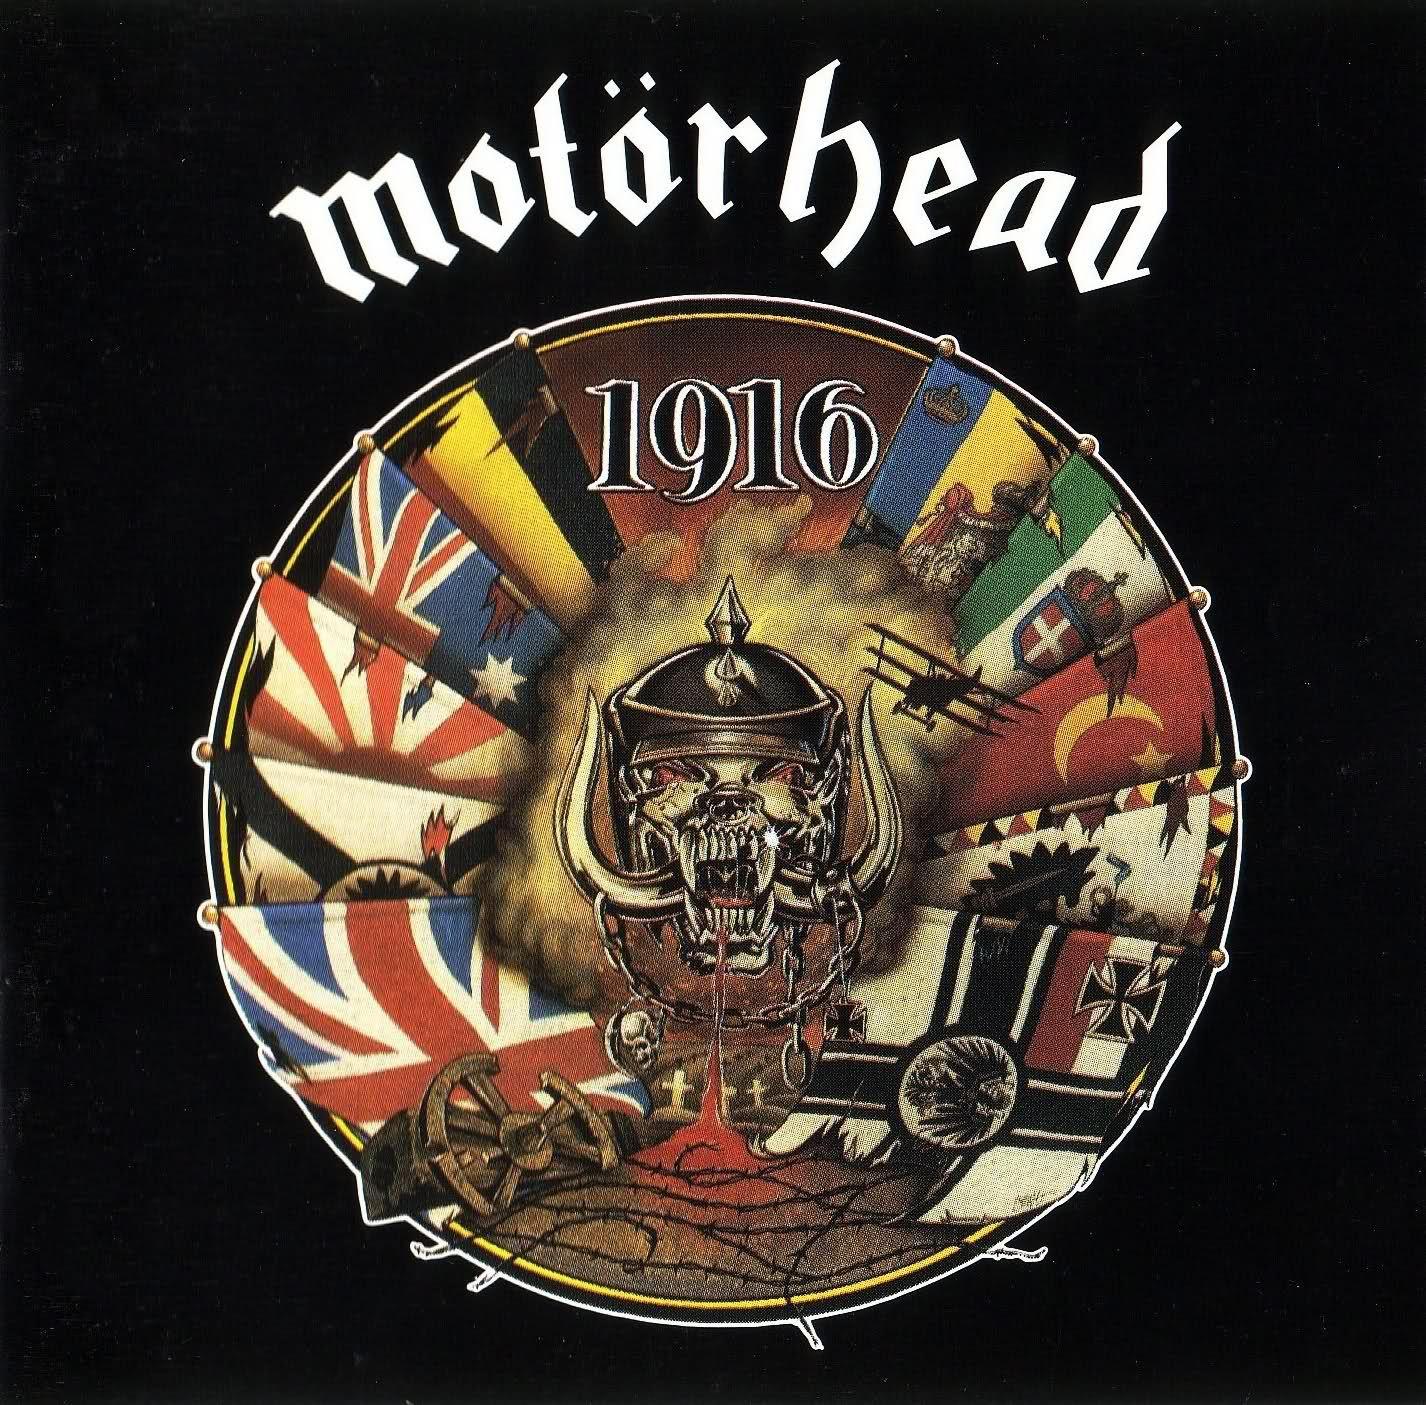 motorhead 1916 *** tier albums pinterest hard rock and